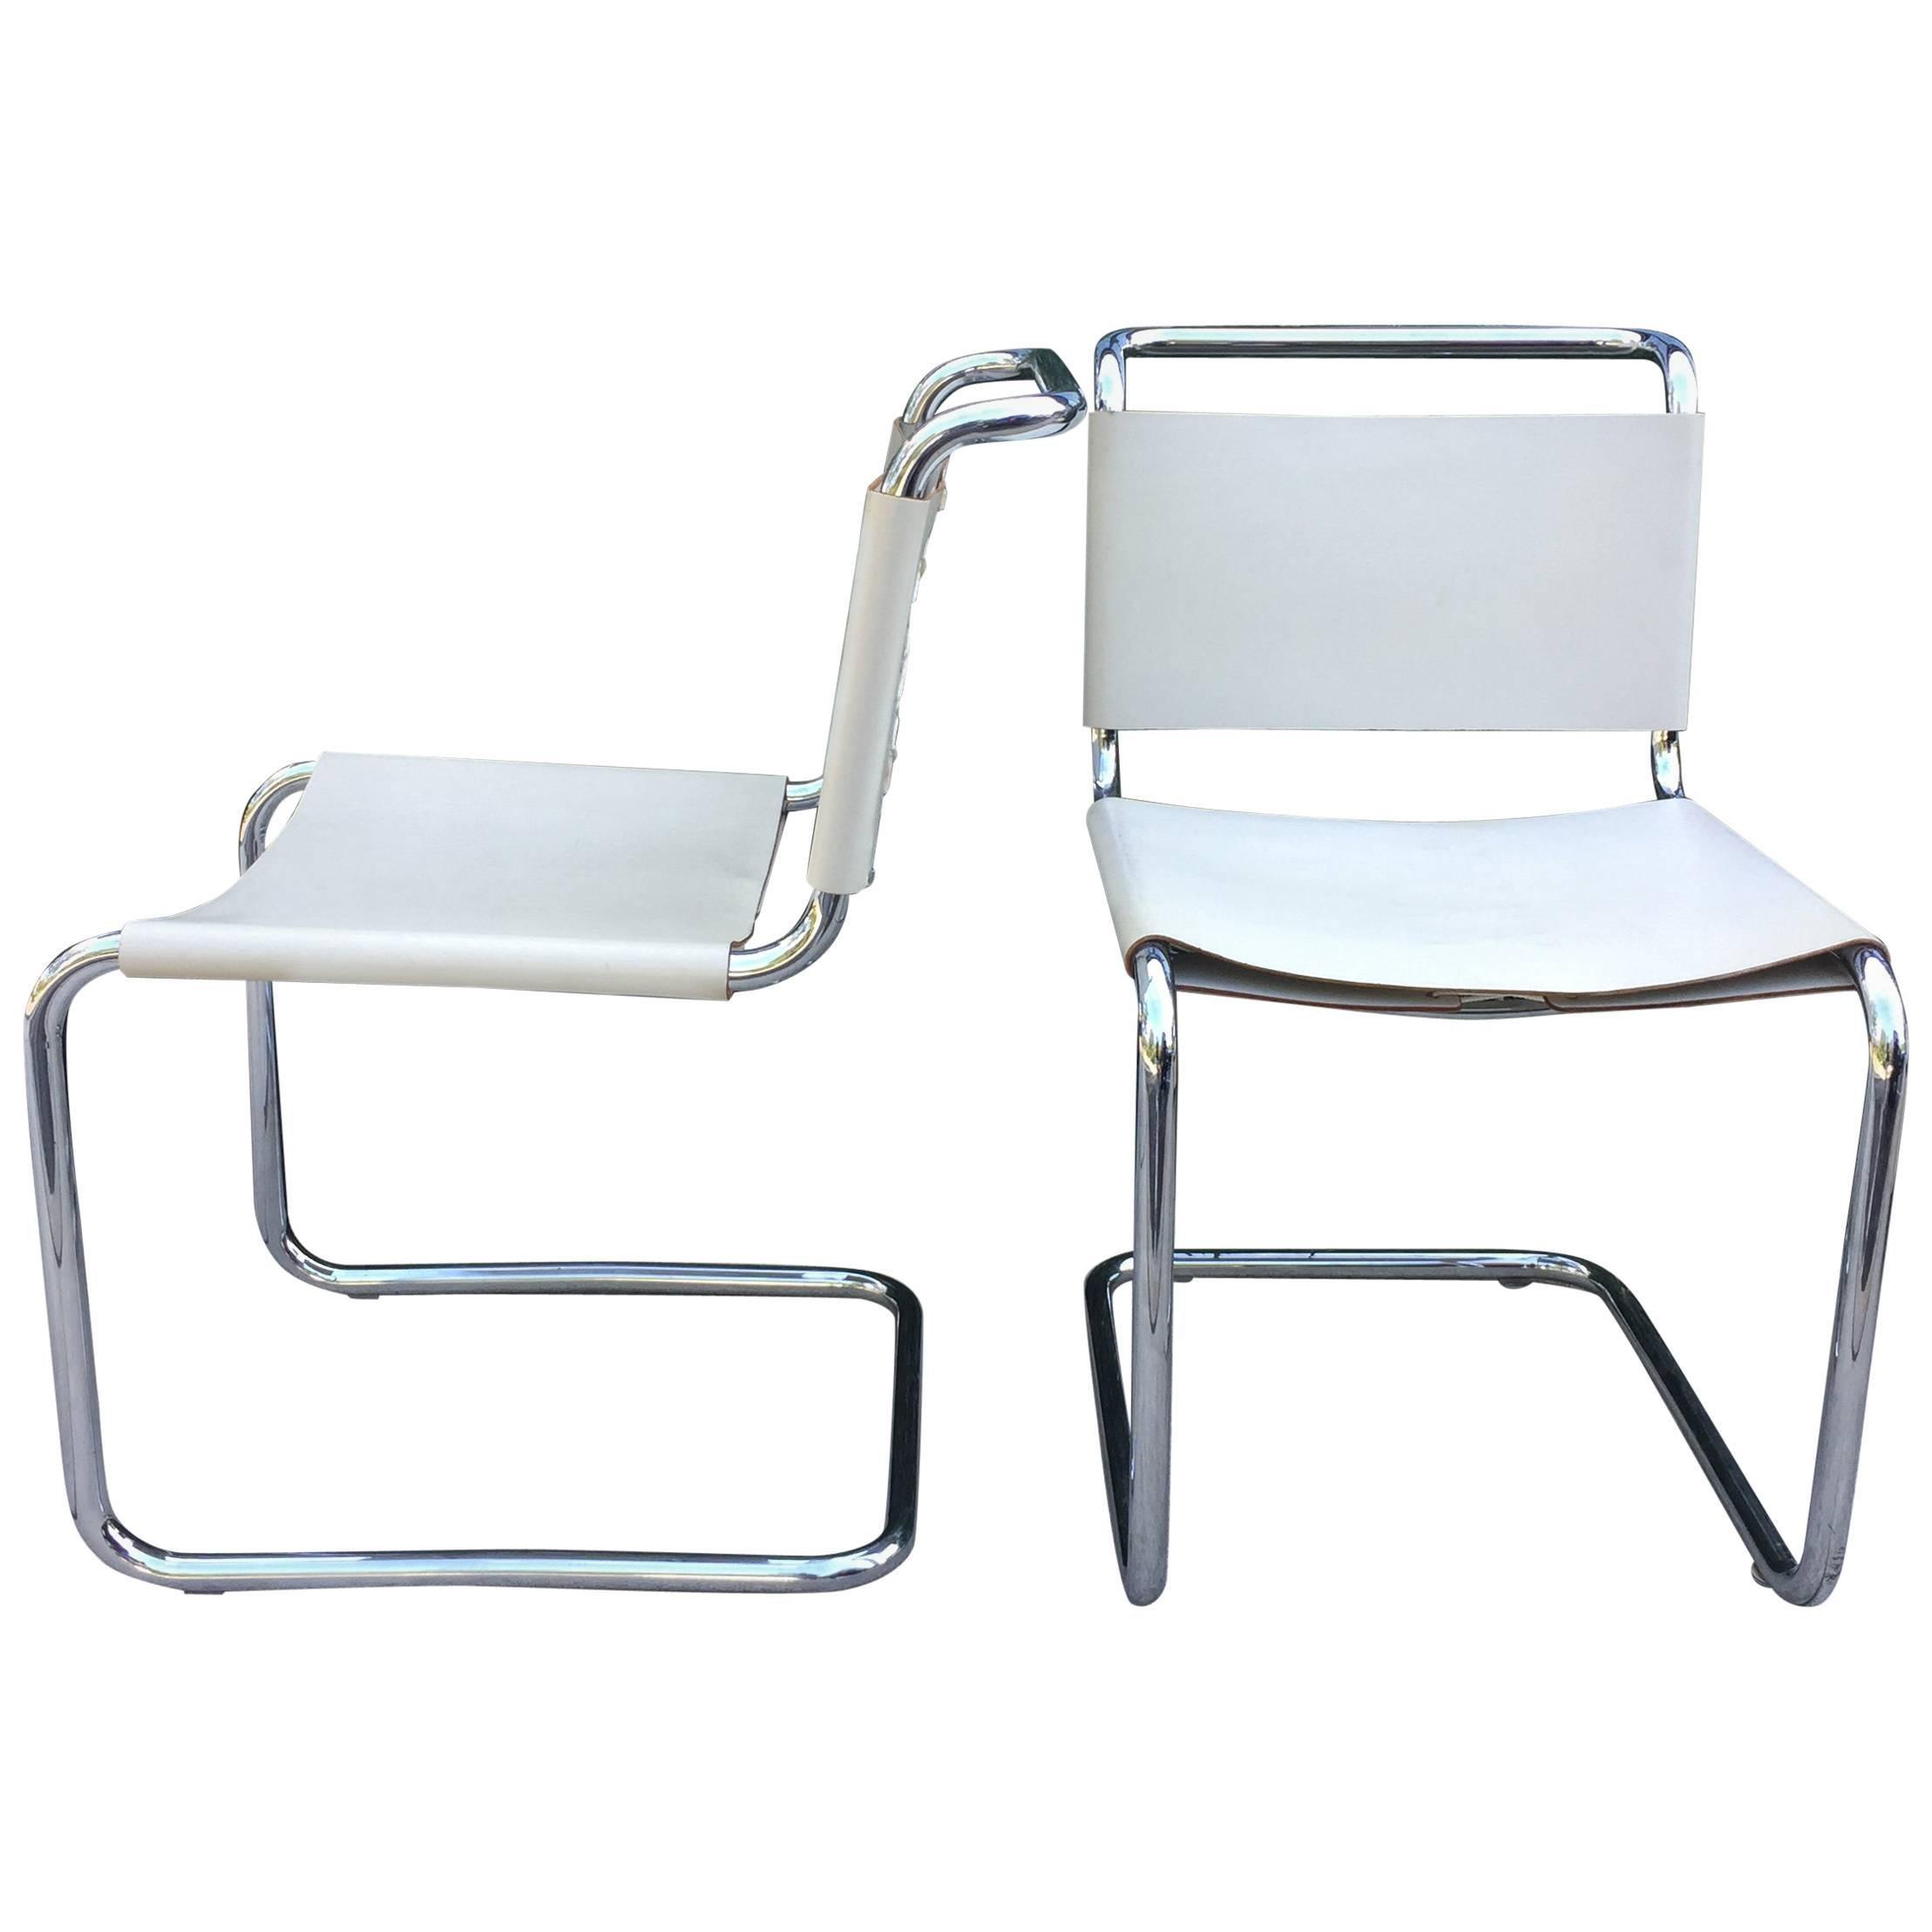 Marcel Breuer Tubular Chairs, Pair For Sale